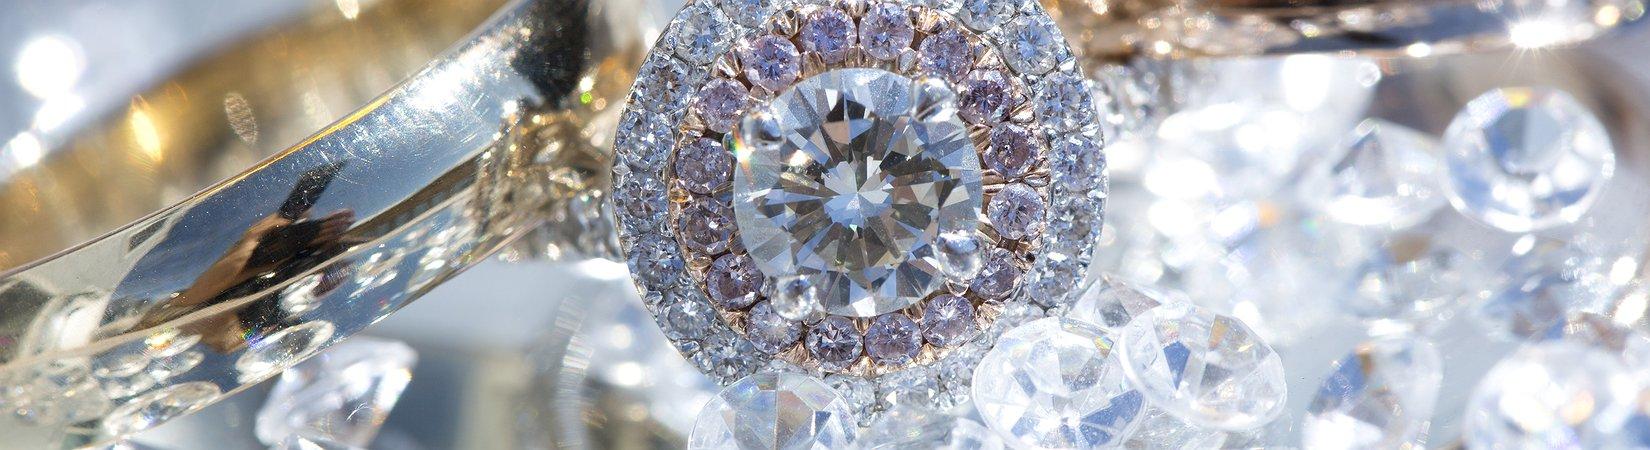 De Beers spenderà 140 milioni di dollari in pubblicità di diamanti